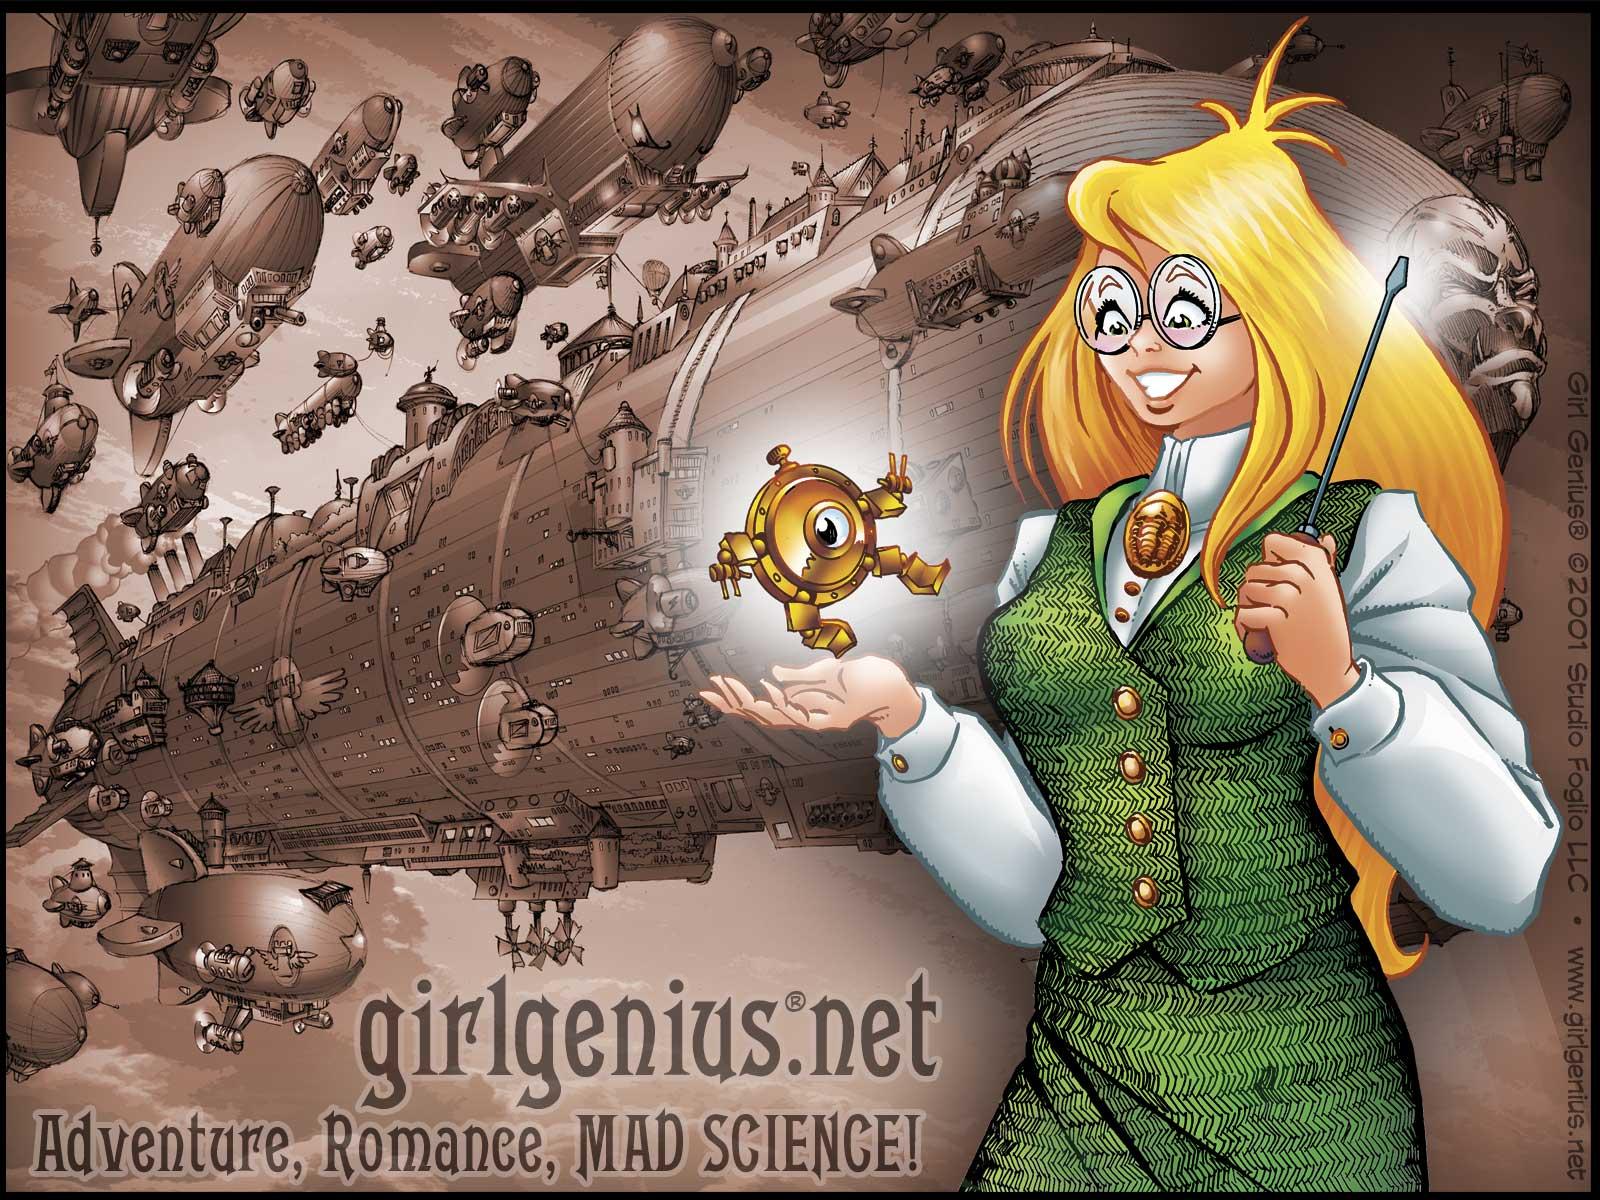 Free Download Wallpaper Anime Girl Girl Genius Online Comics